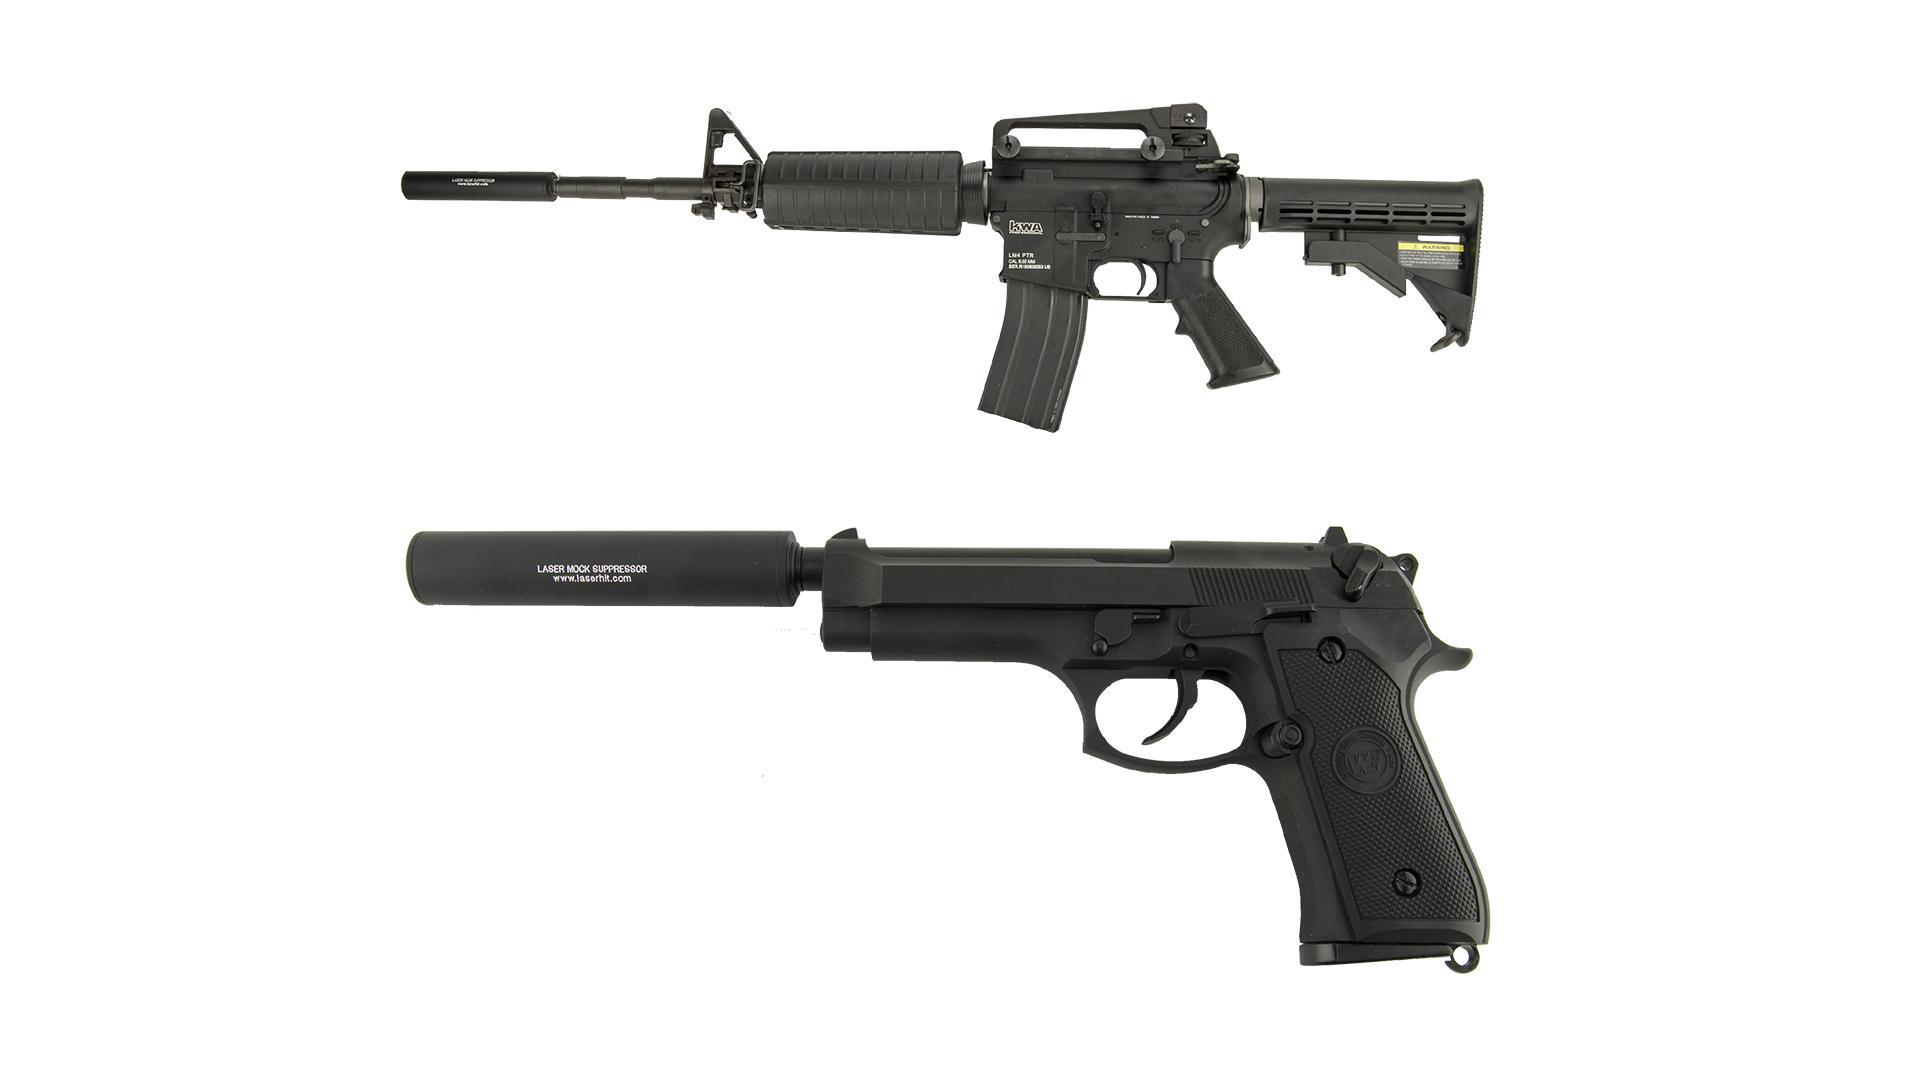 M4-M9-01-hd.jpg